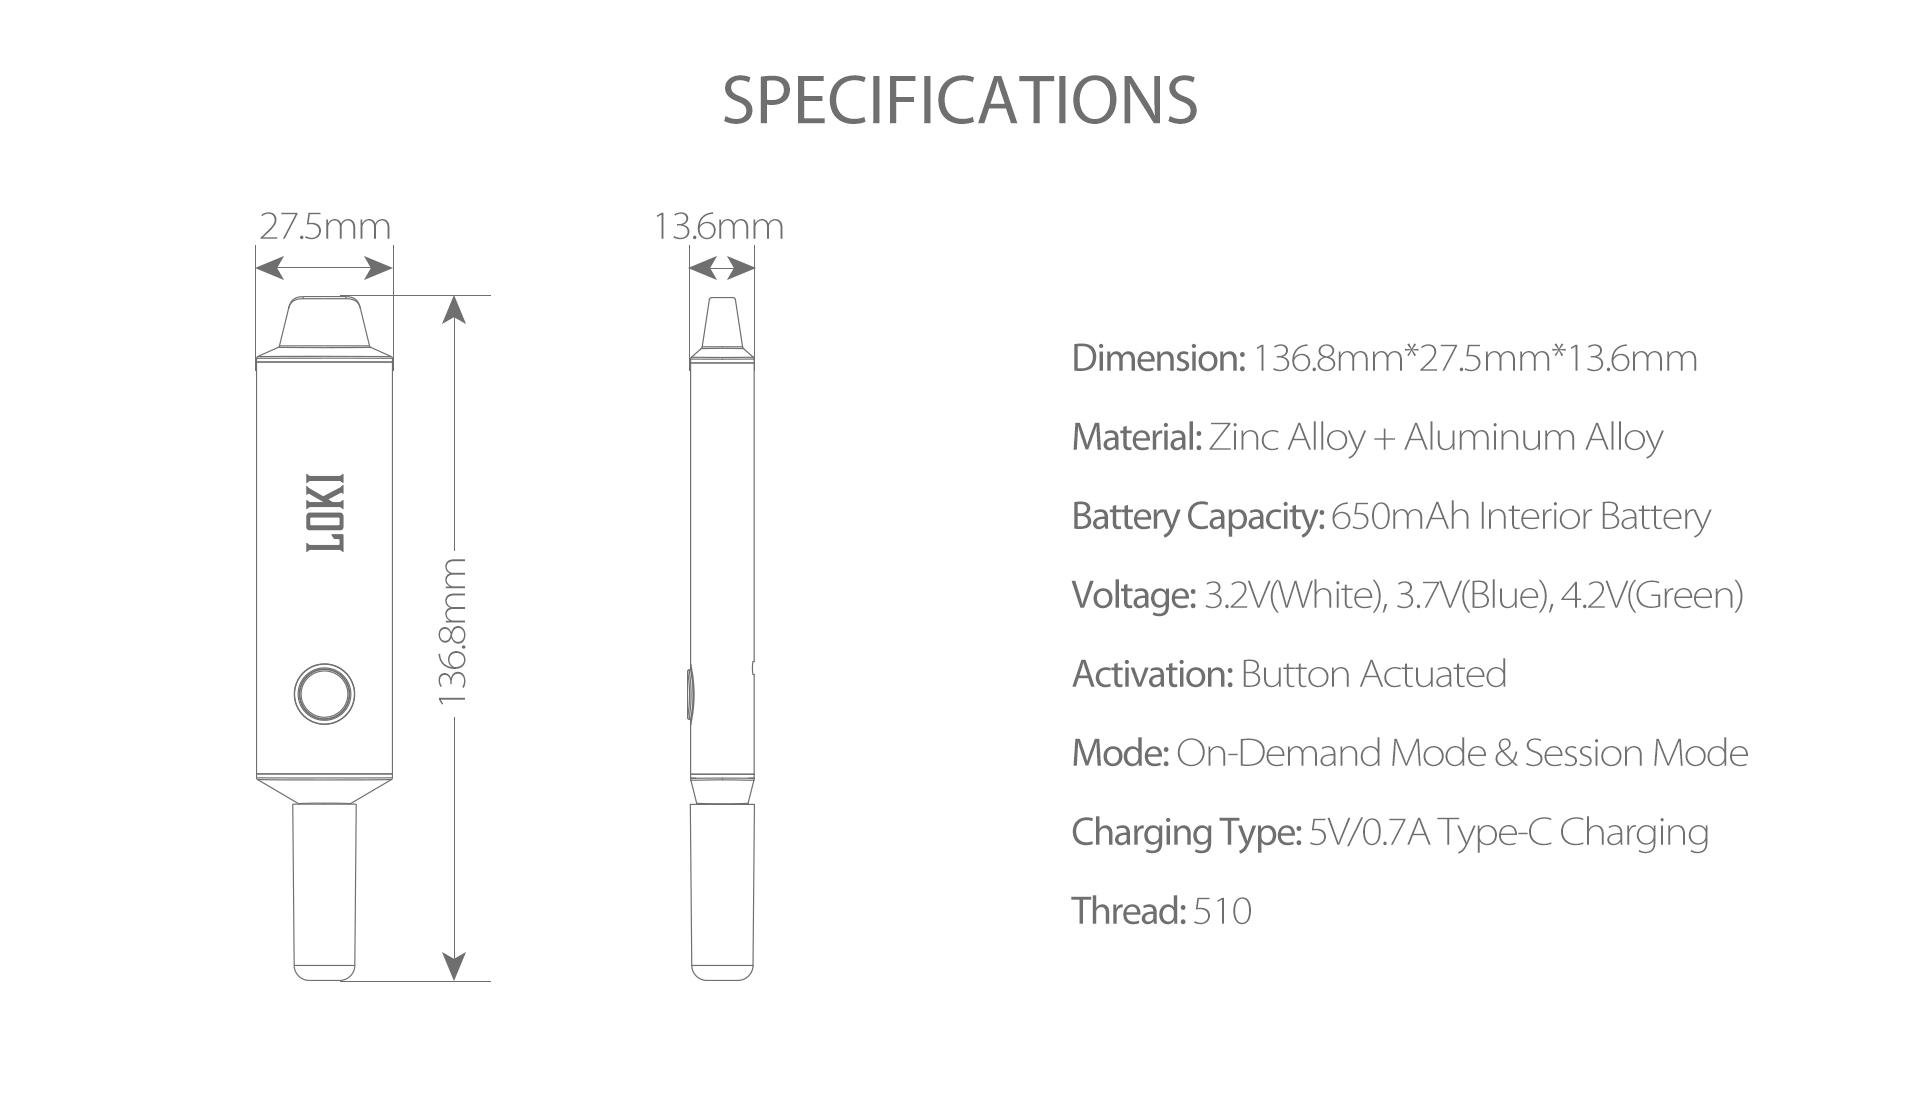 Yocan Loki Portable Vaporizer Pen Specifications.